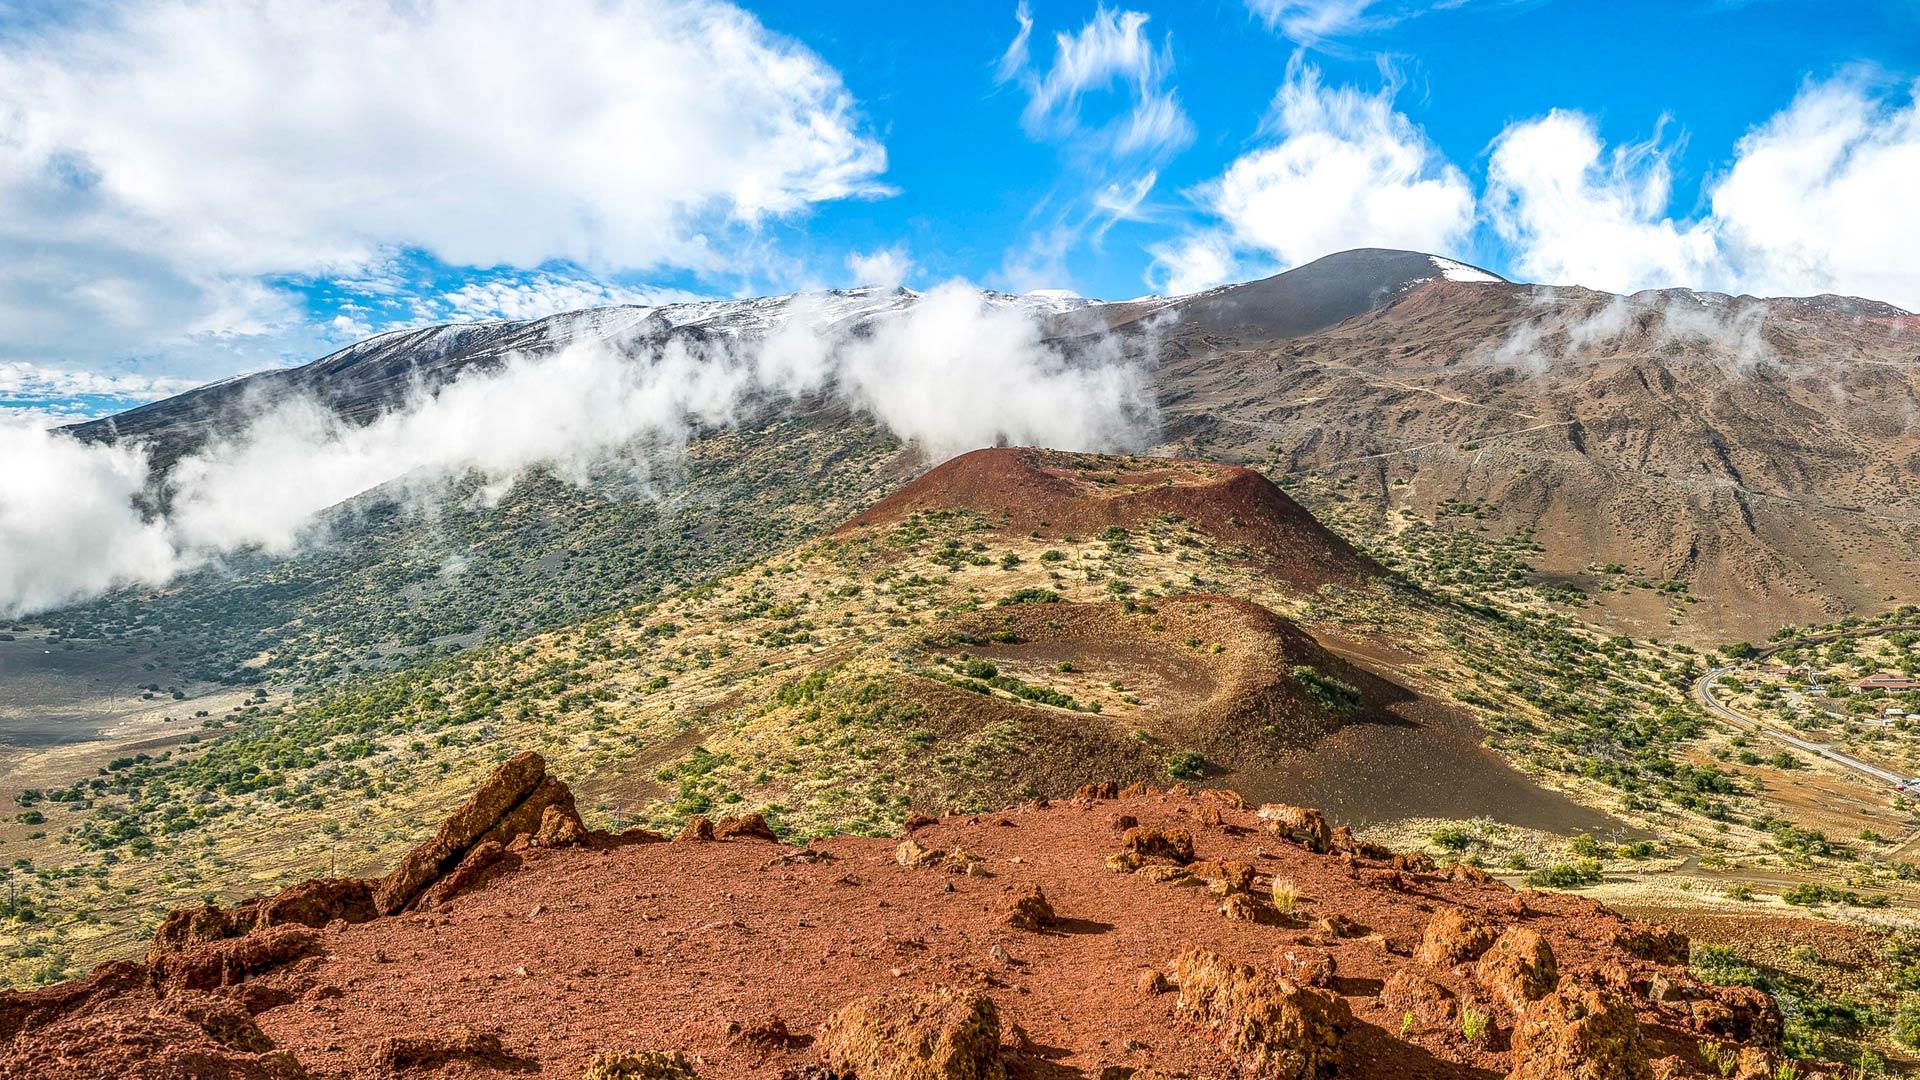 The legendary Mauna Kea peak is big island Hawaii's highest point at 13,802'